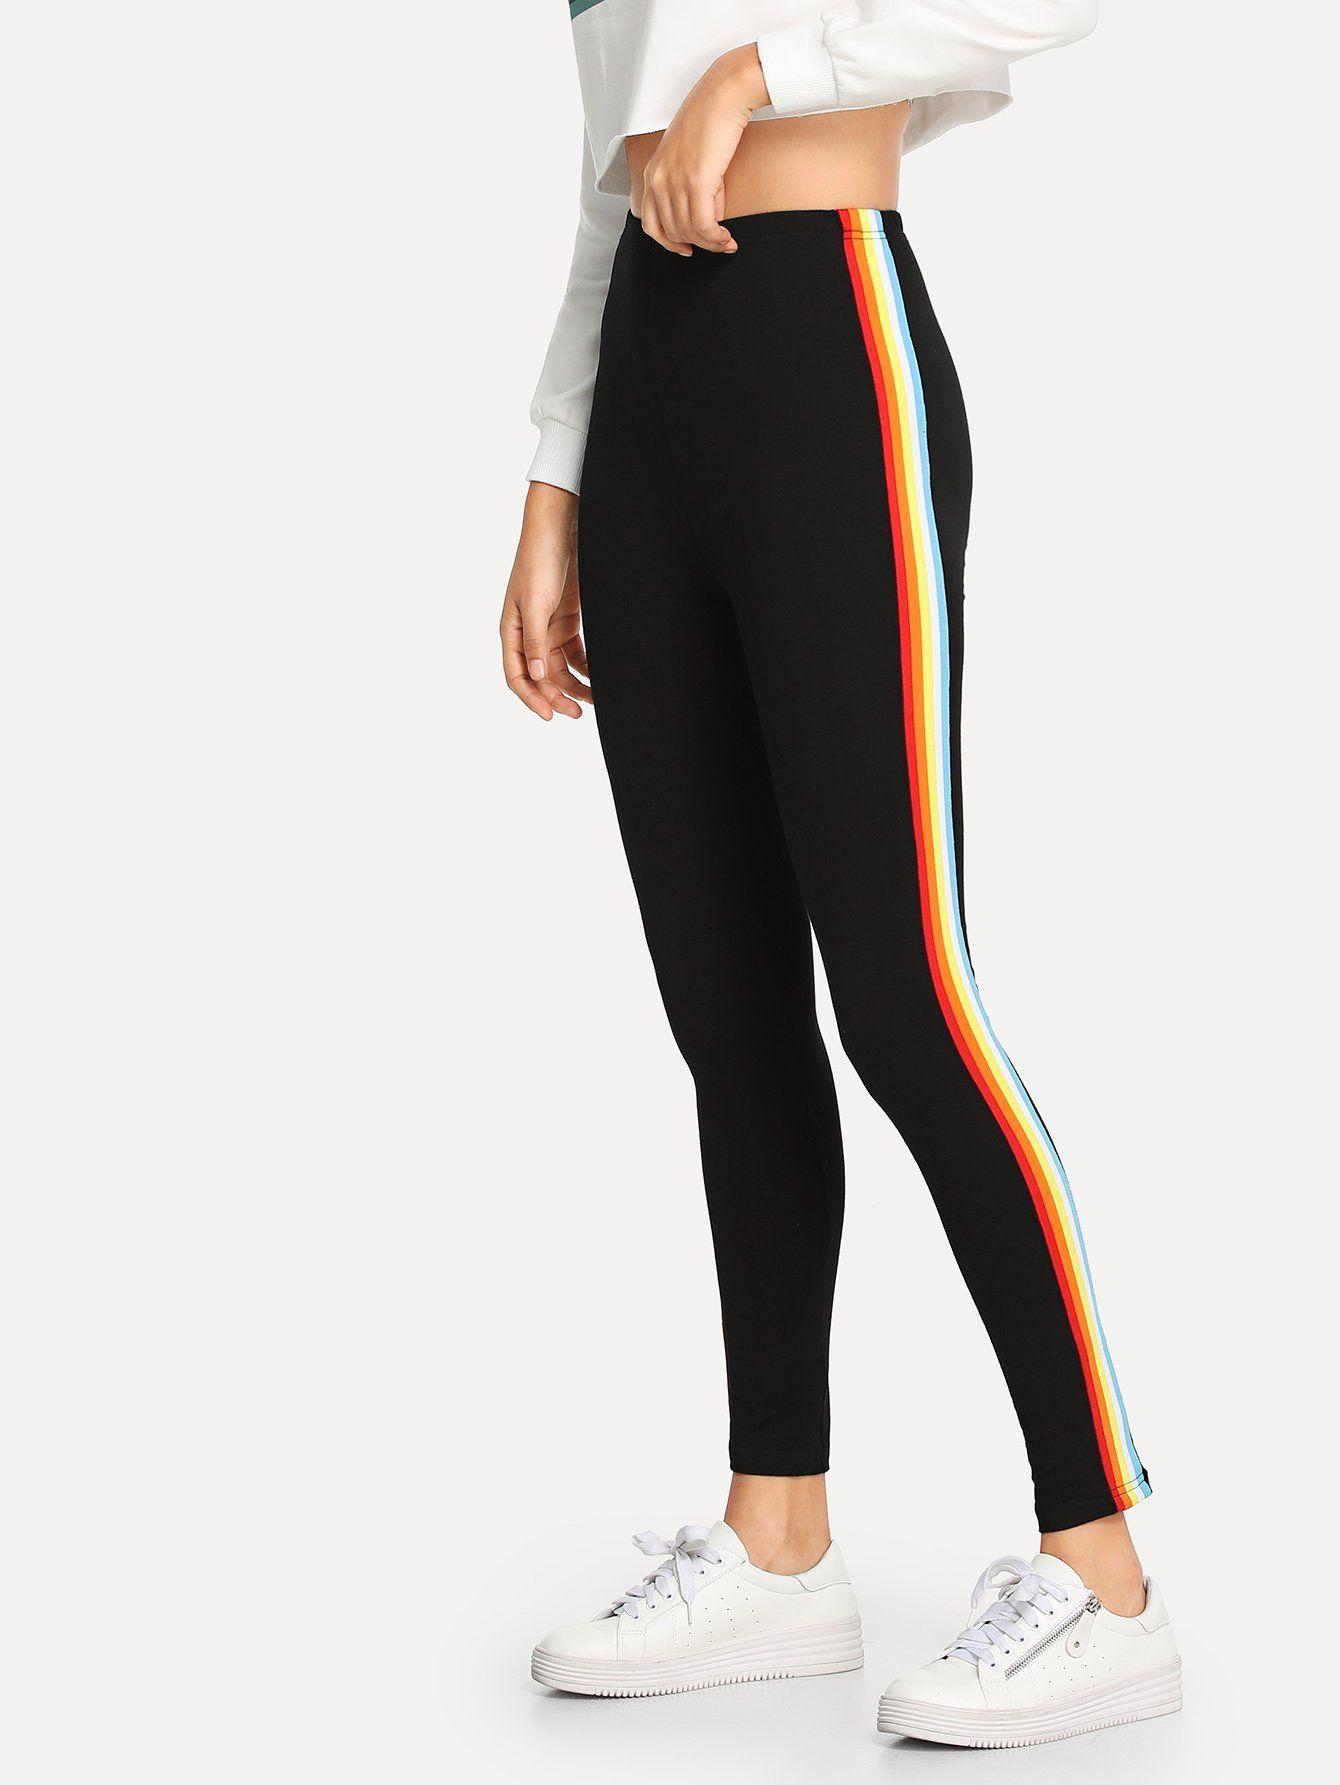 3ff1eee25edc8 Striped Side Skinny LeggingsFor Women-romwe   christmas list in 2019 ...